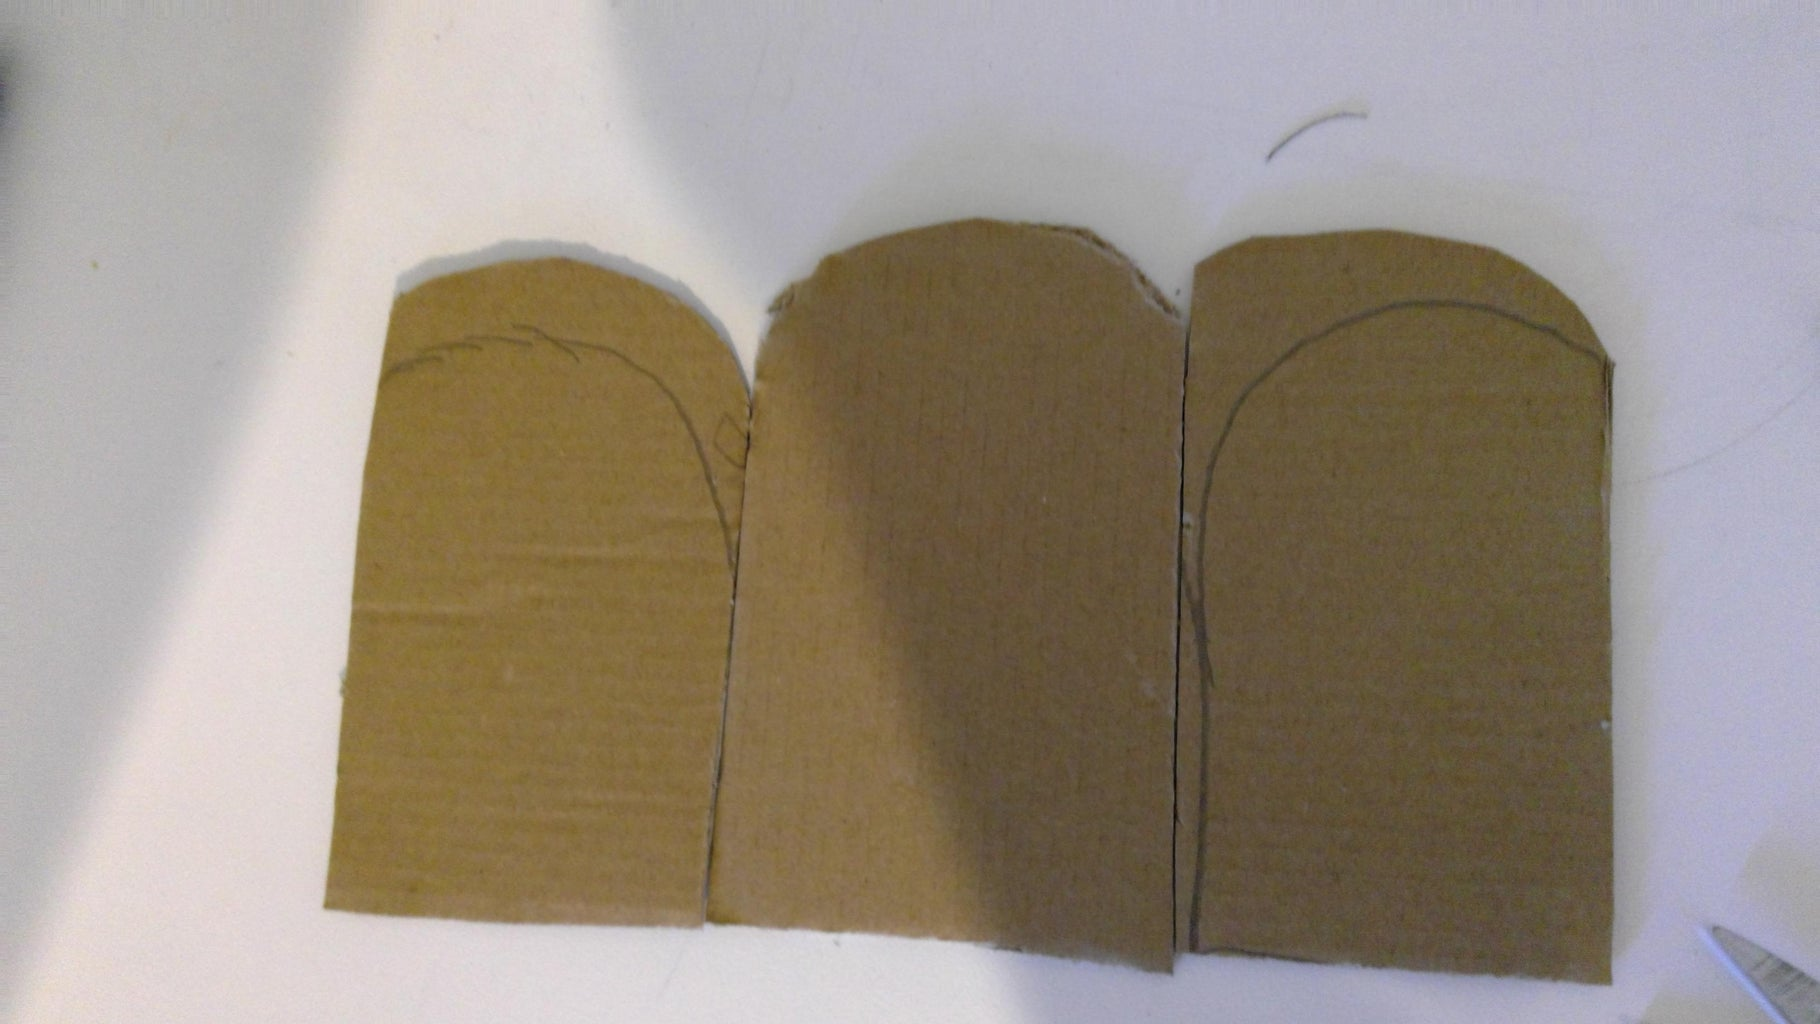 Prepare Cardboard